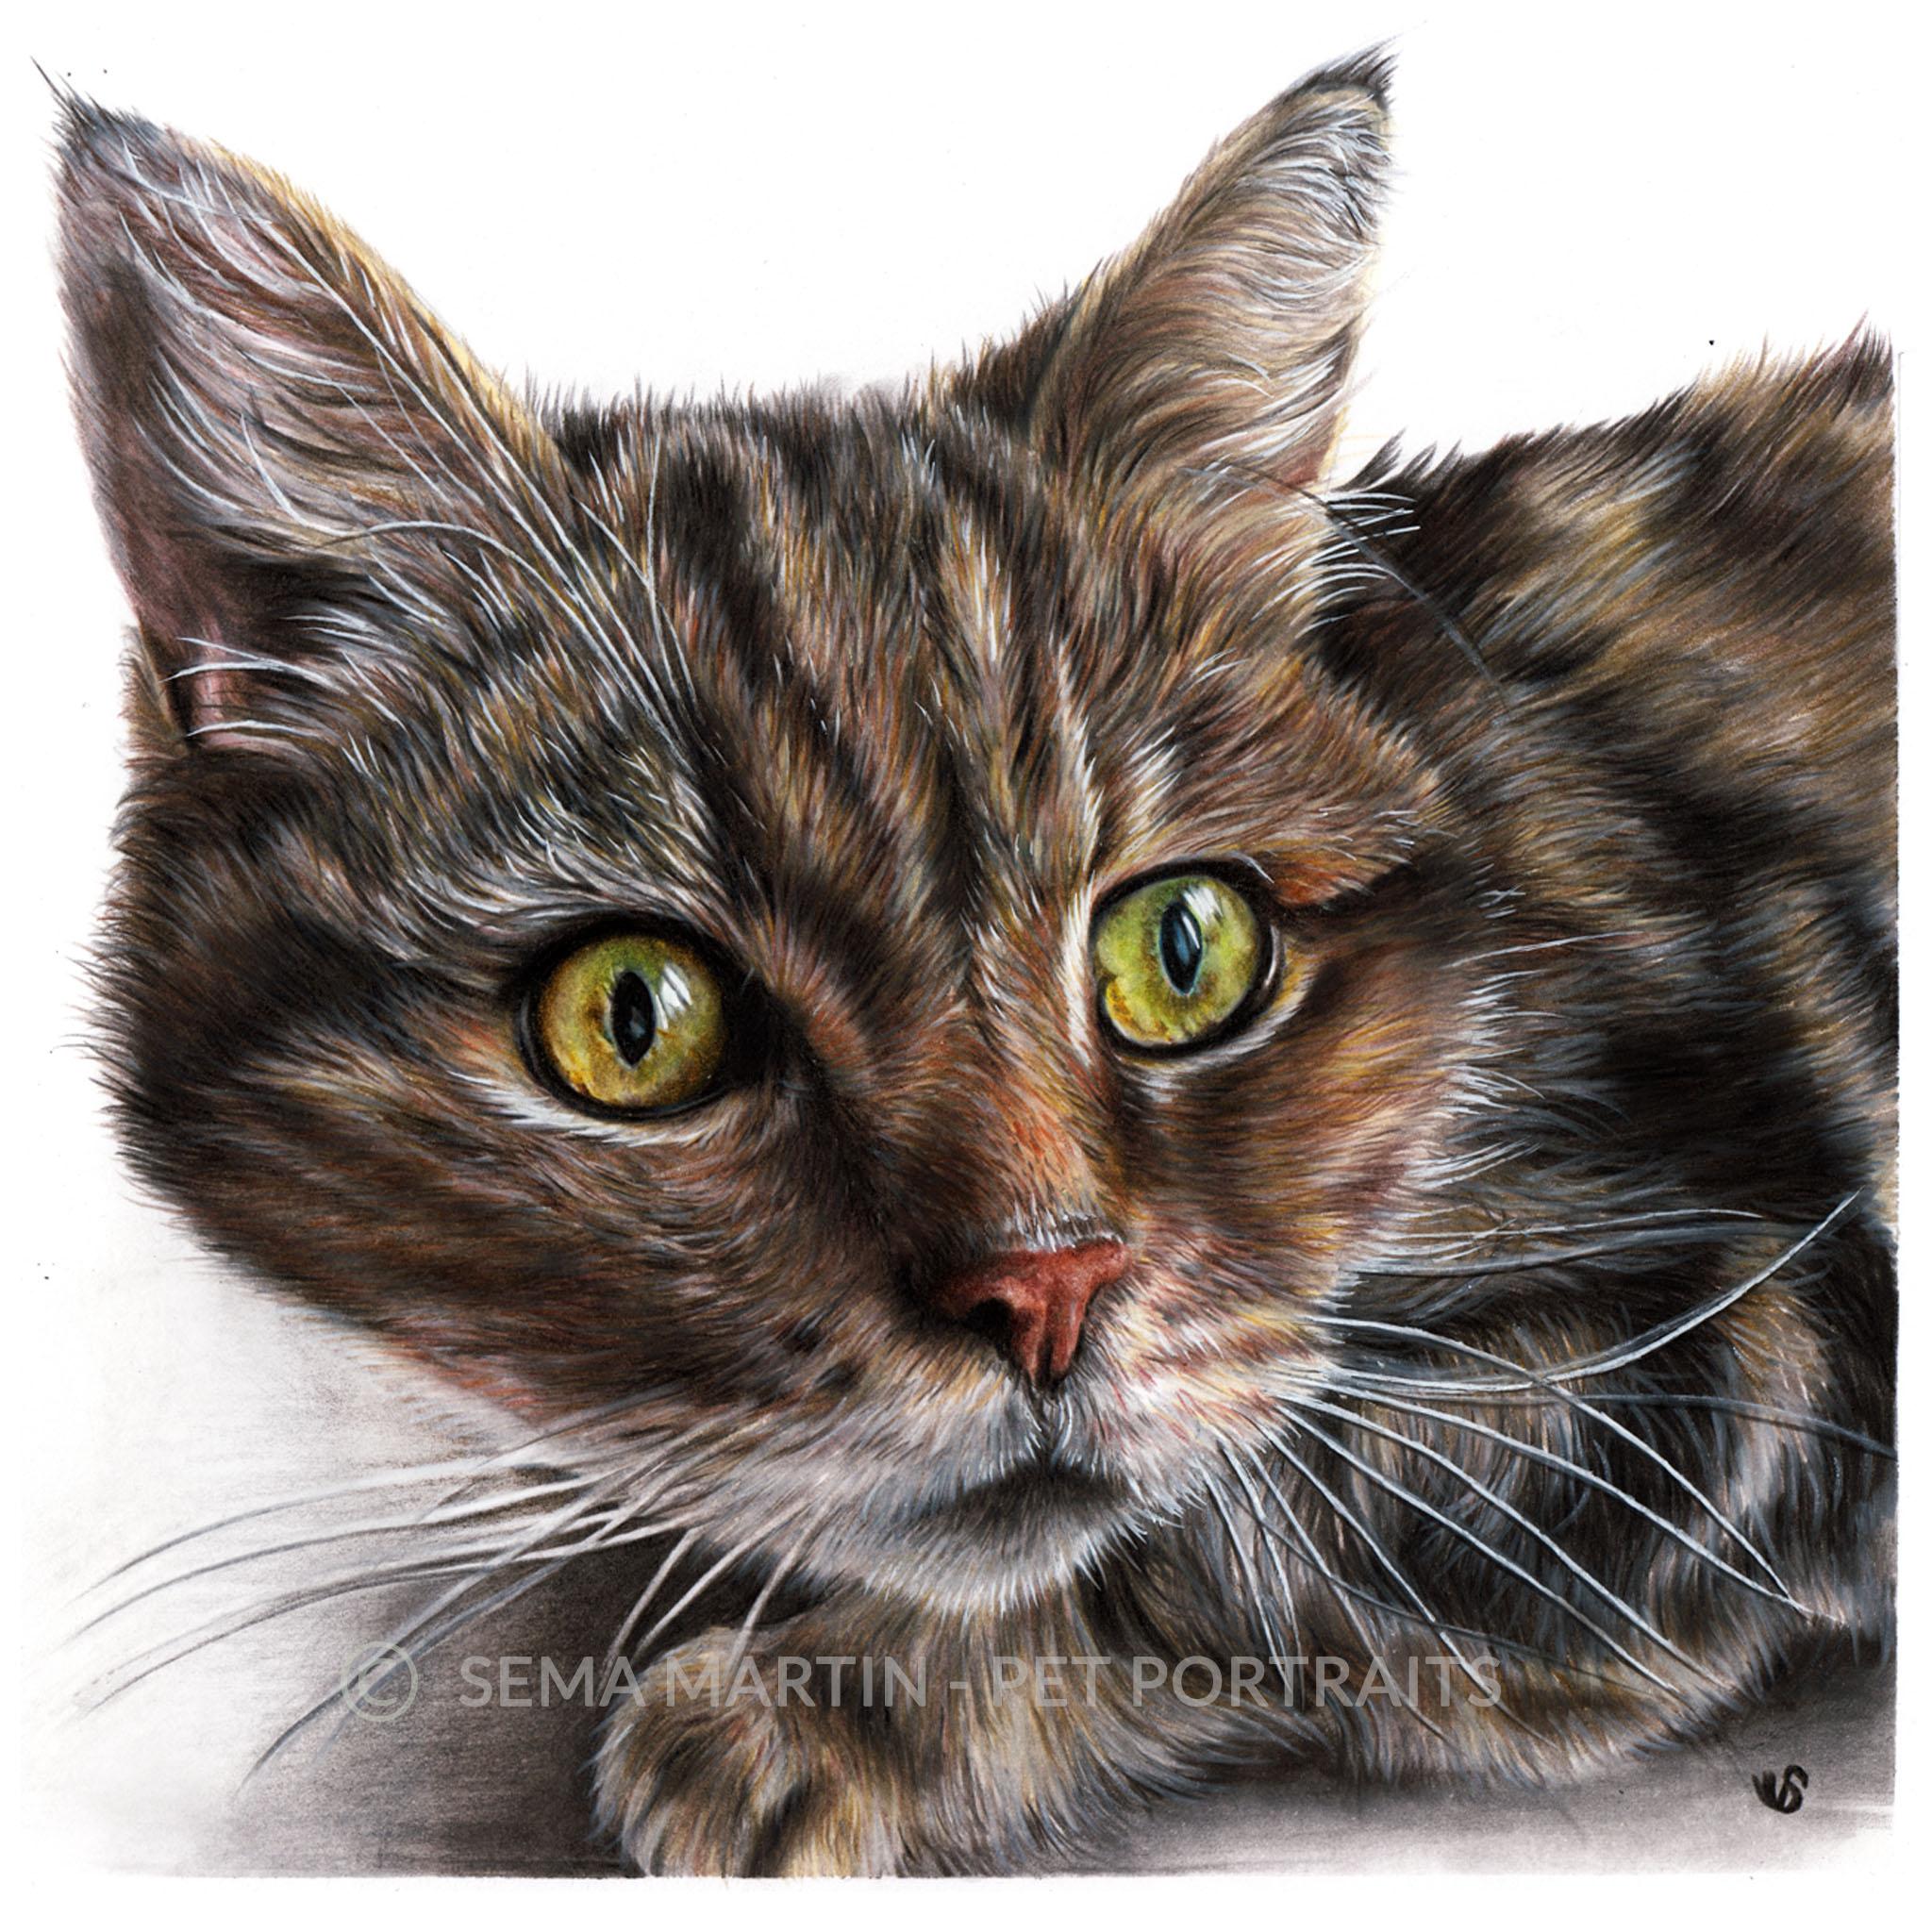 'Benny' - UK, 8.3 x 11.7 inches, 2018, Colour Pencil Cat Portrait by Sema Martin